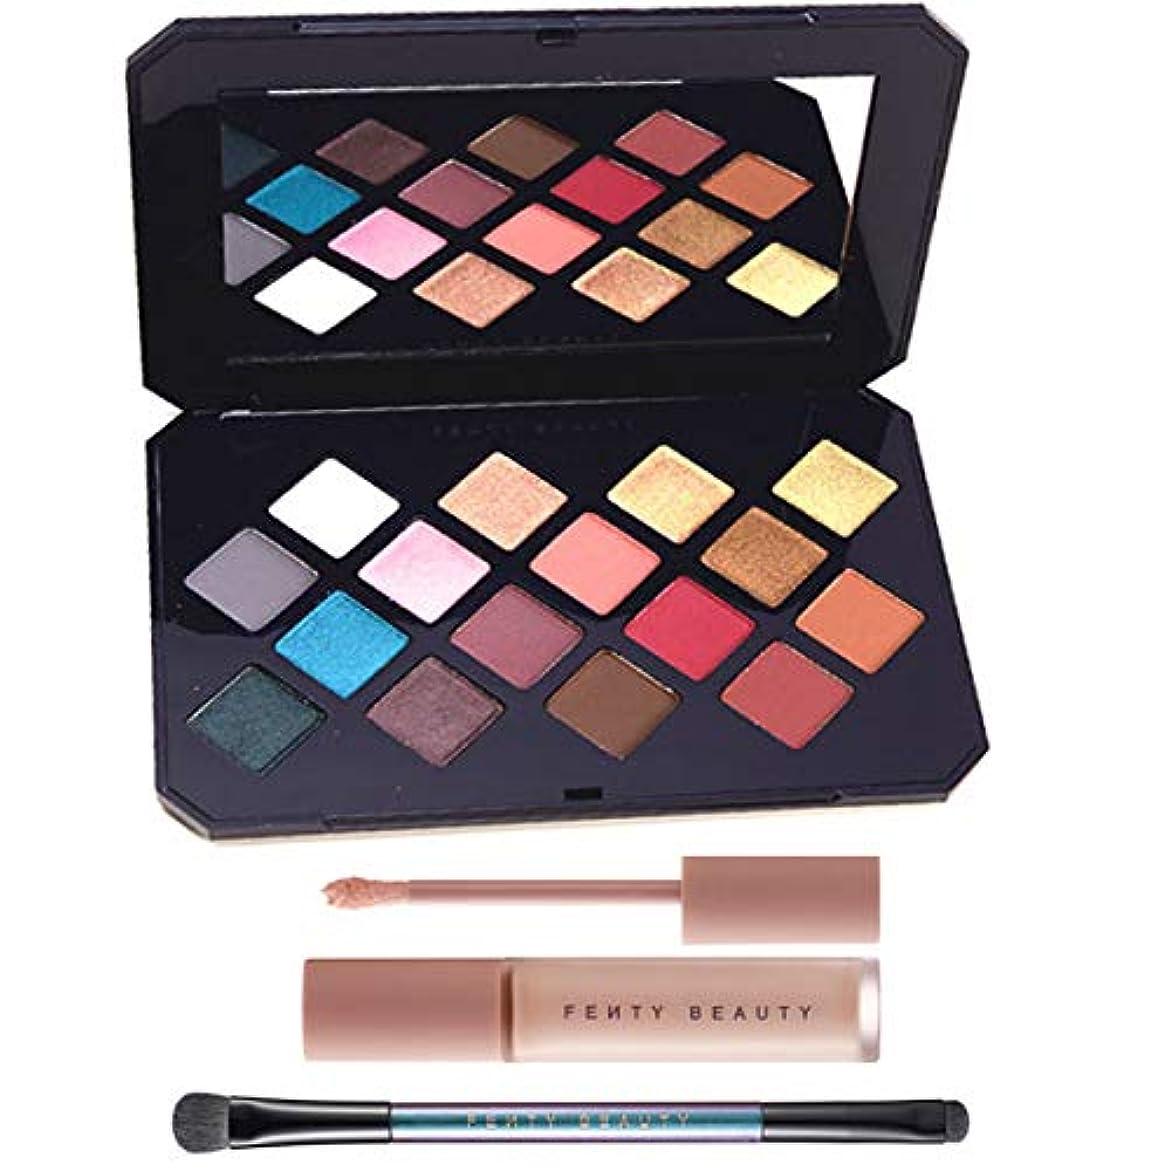 近似洞窟致命的FENTY BEAUTY BY RIHANNA, Moroccan Spice Eyeshadow Palette & Eye Essentials [海外直送品] [並行輸入品]